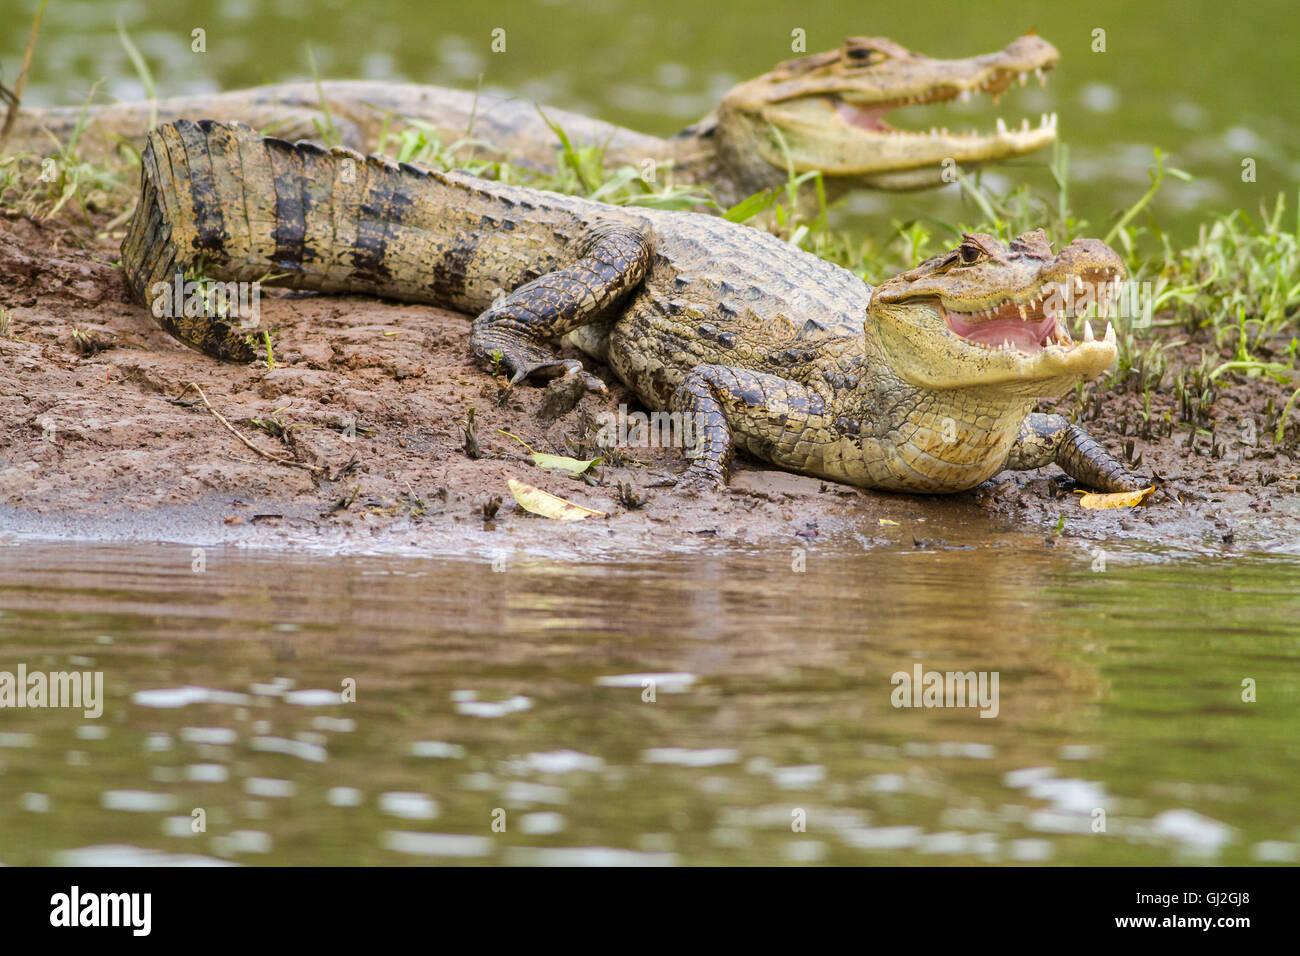 Two caymans (Caiman crocodilus fuscus) , Cano Negro reserve, Alajuela, Costa Rica - Stock Image